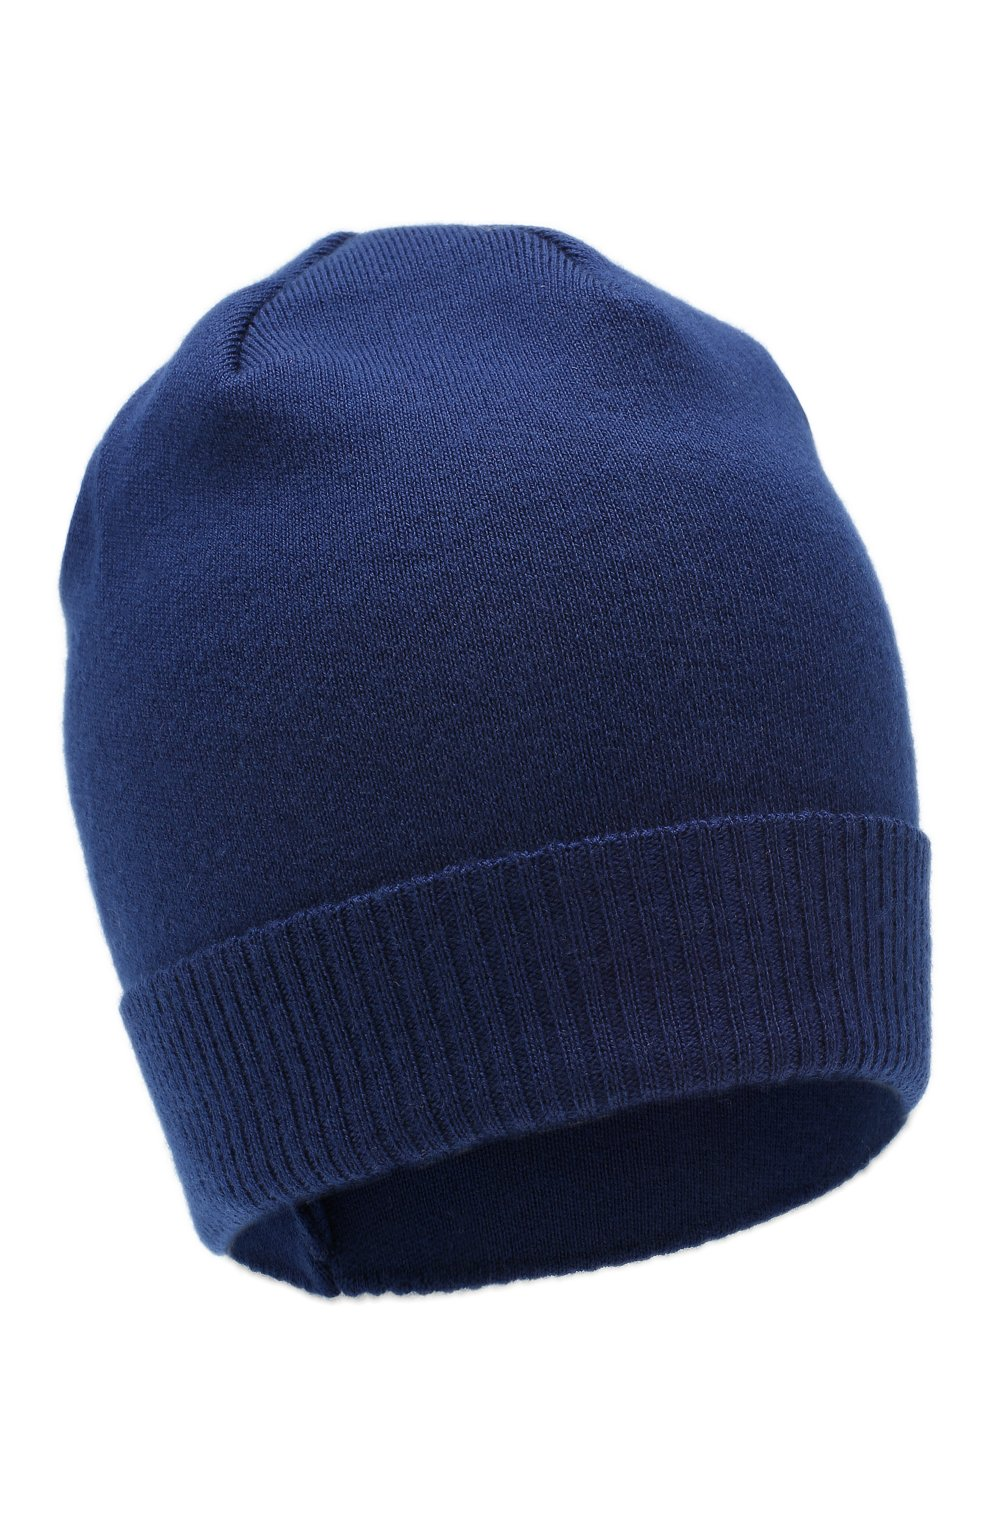 Мужская шерстяная шапка true CANOE темно-синего цвета, арт. 4801041 | Фото 1